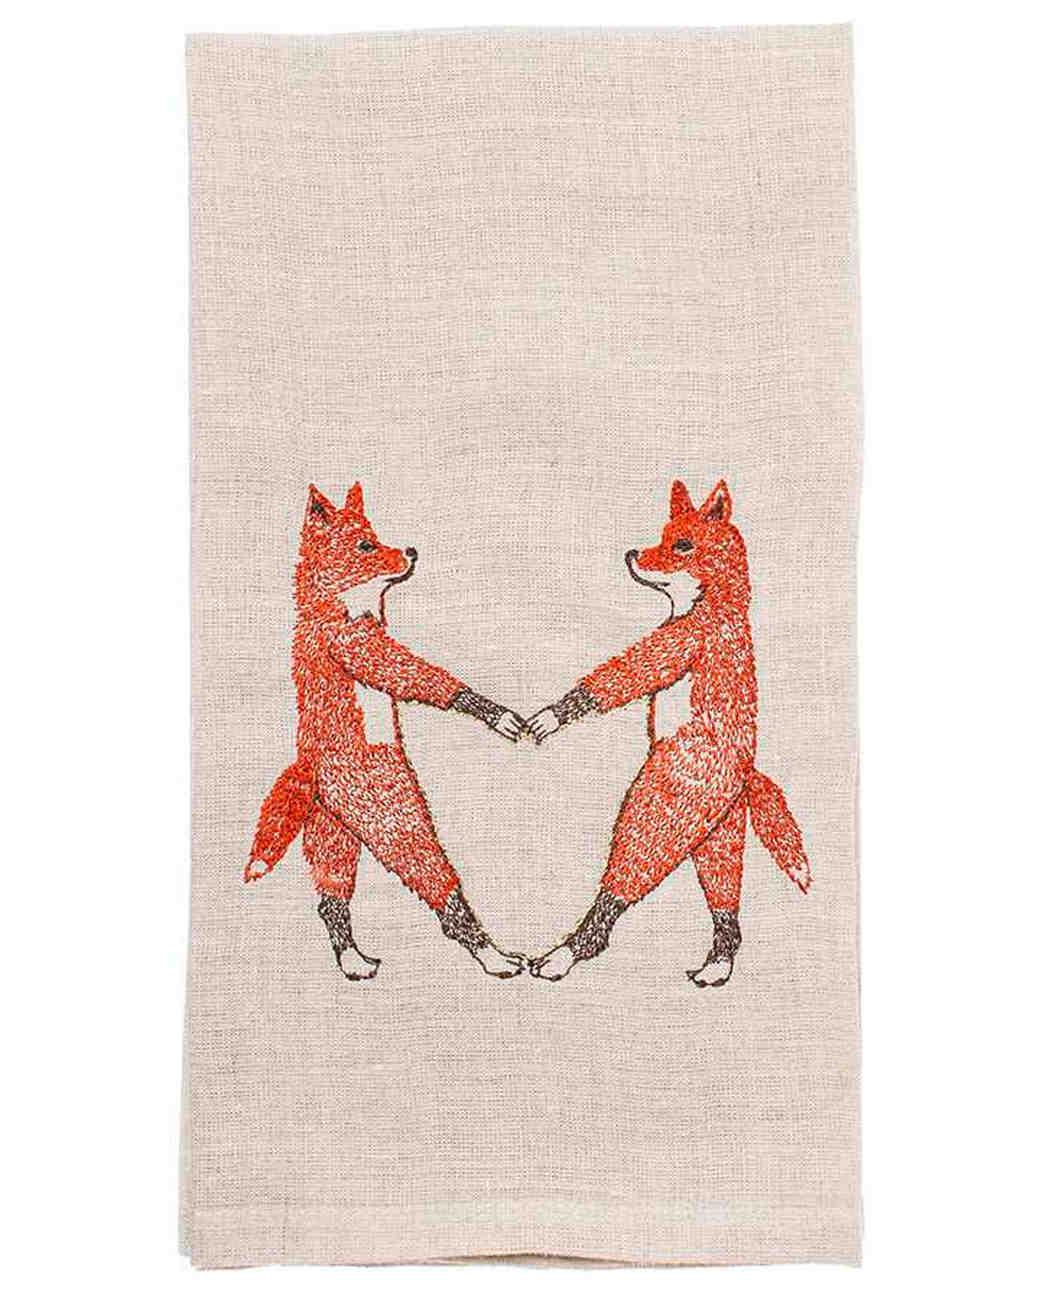 bridesmaid-gifts-tea-towel-1215.jpg